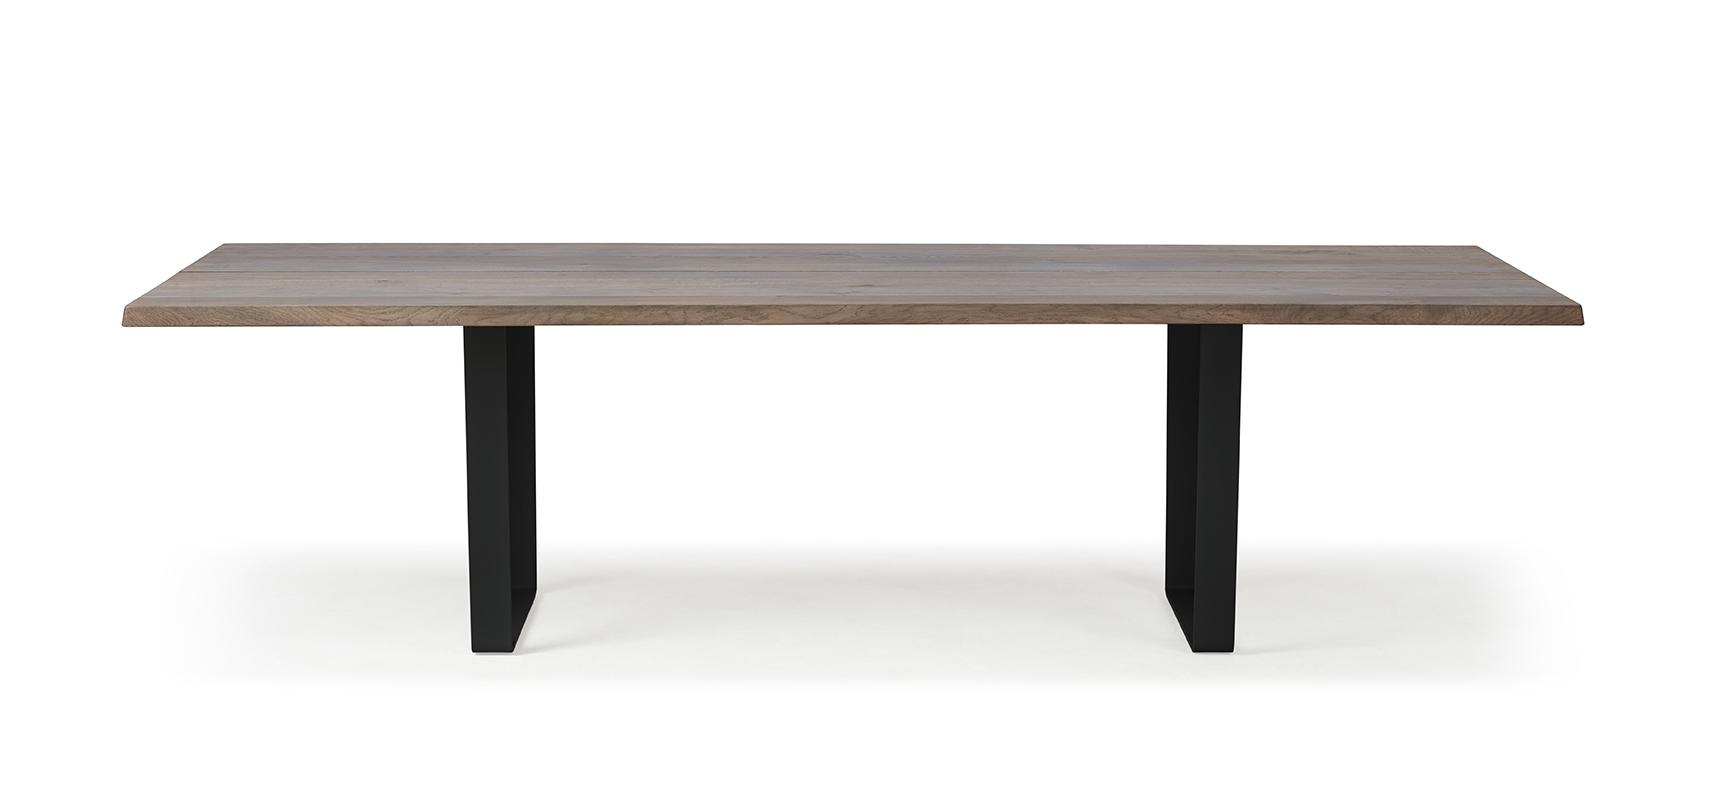 Lowlight table by dk3 tavolo design scandinavo - Tavolo scandinavo ...